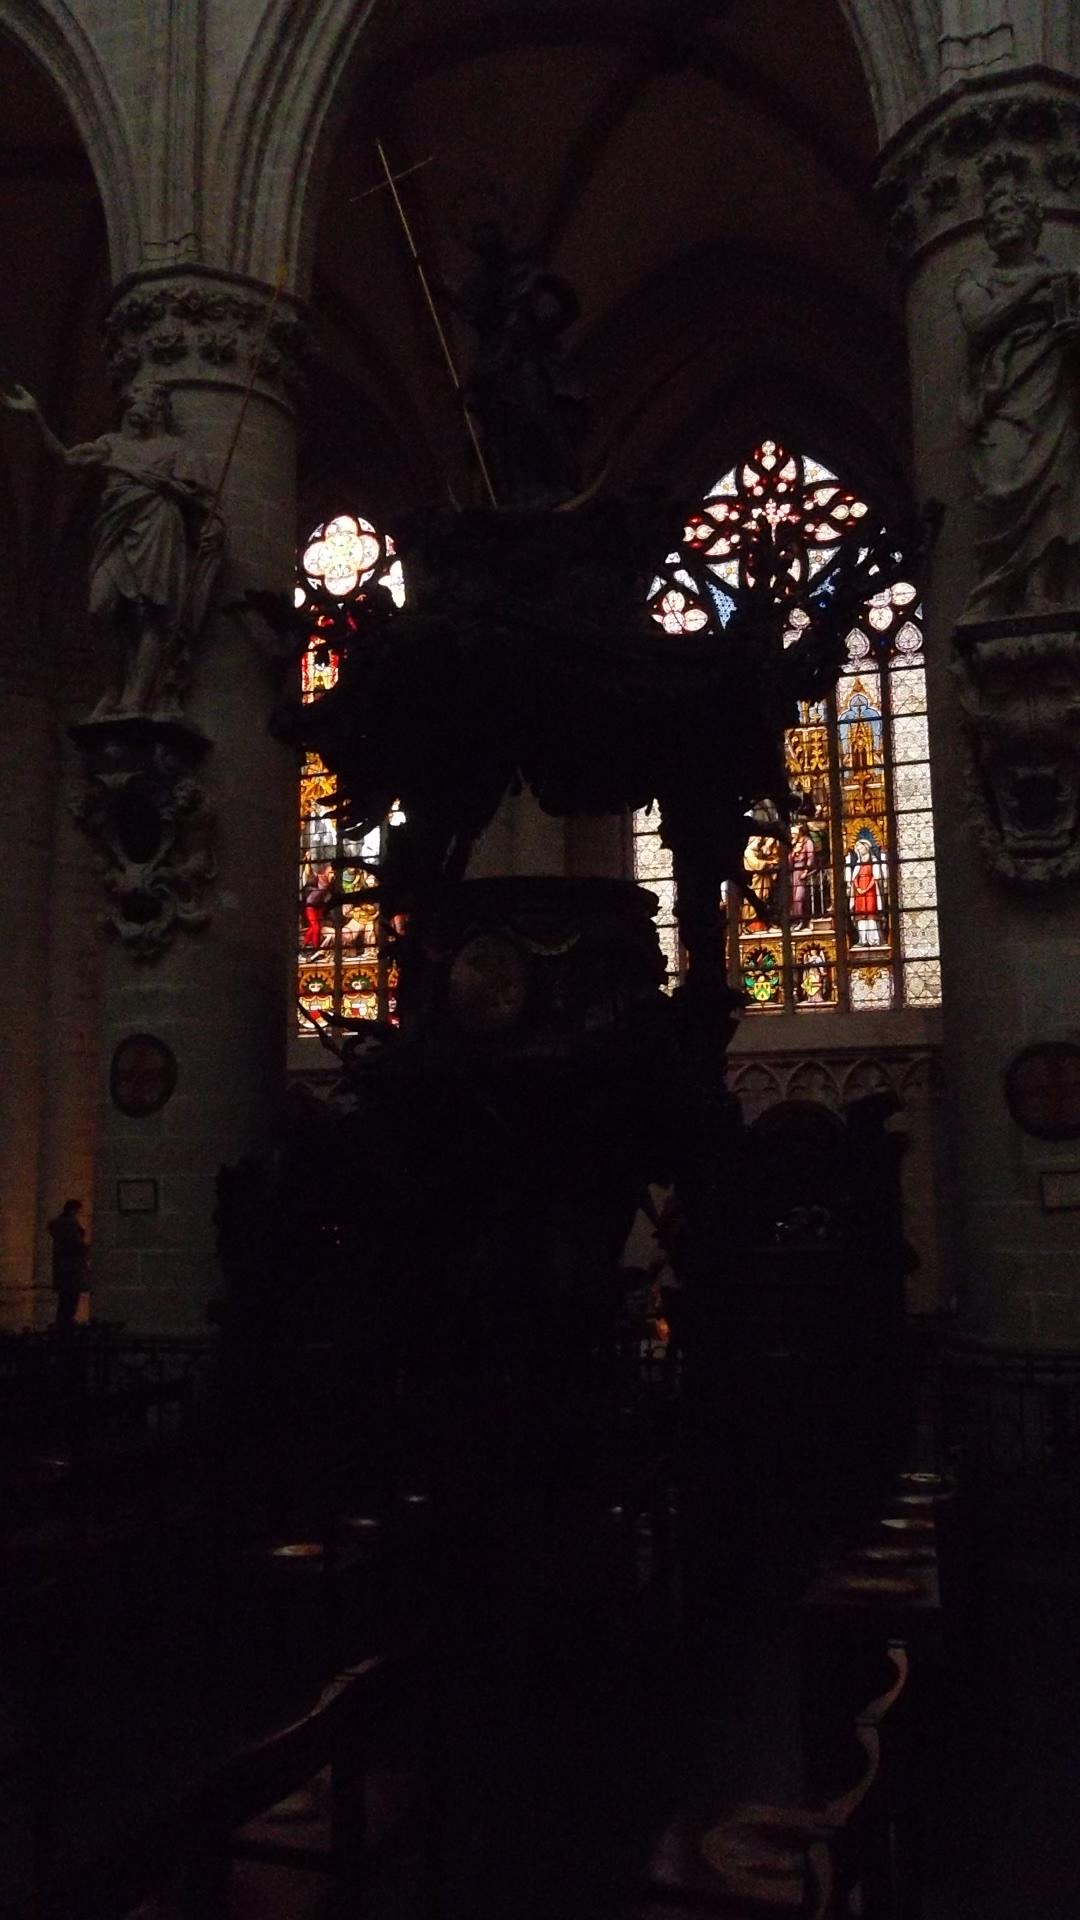 bru-cathedral-st-michel-st-gudule-stairs-dec12